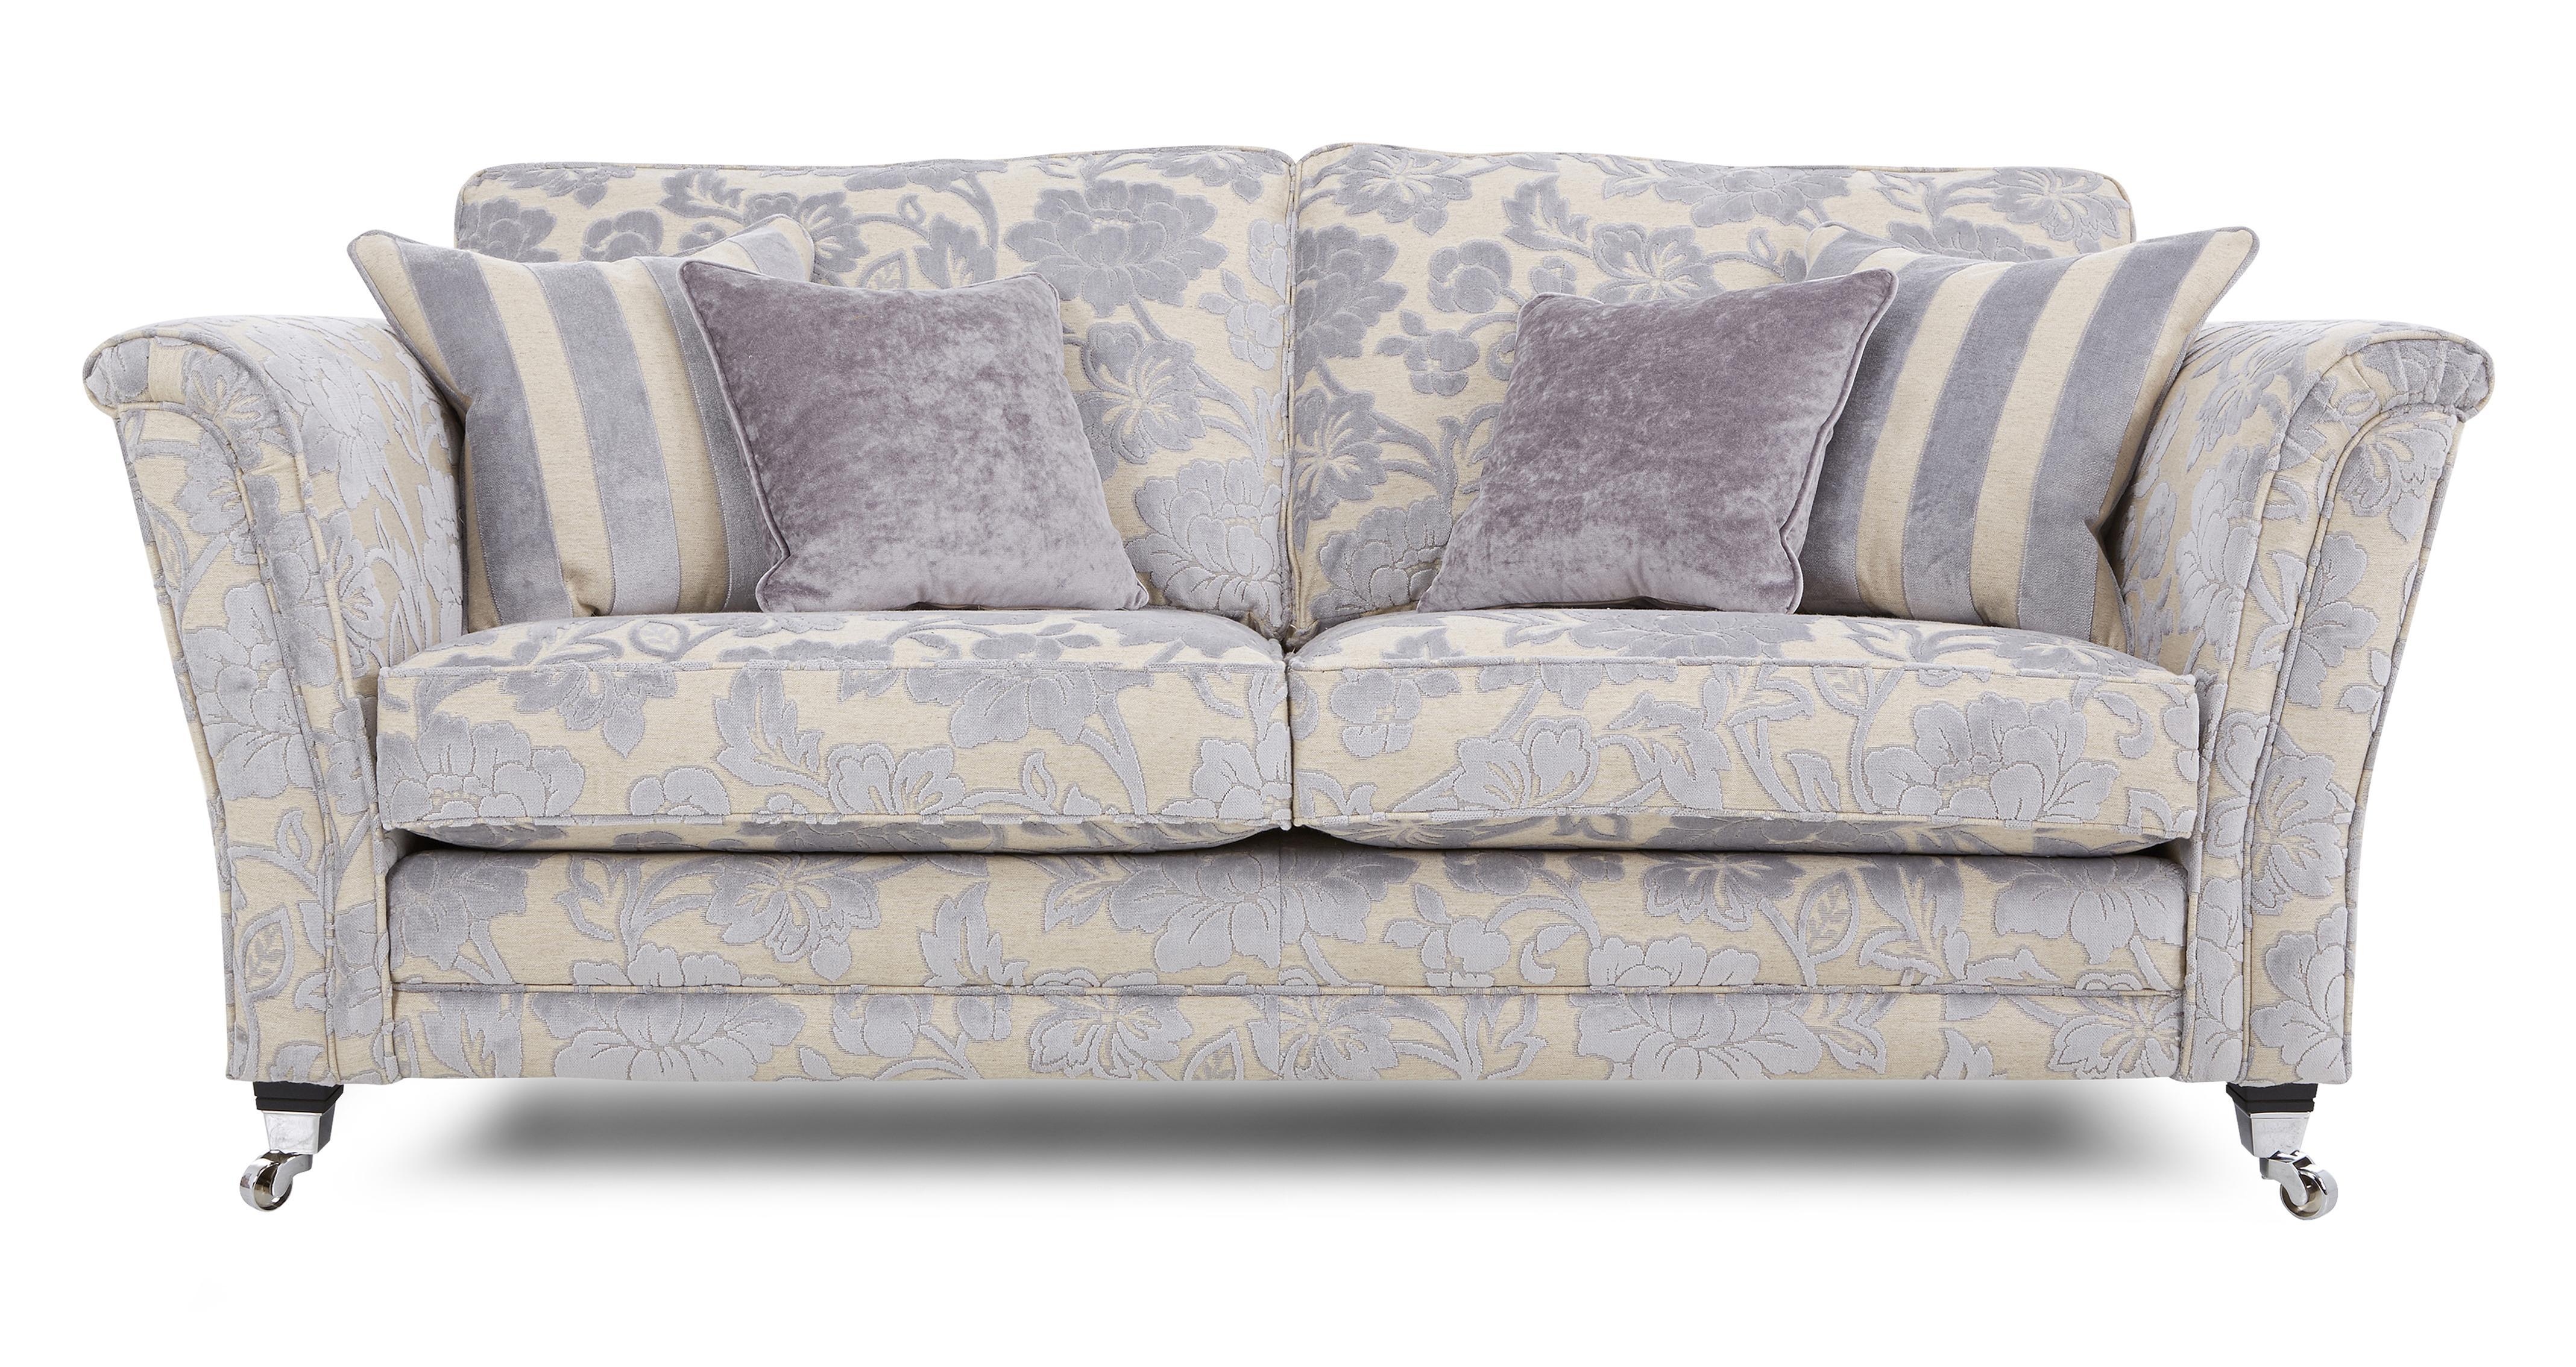 Hogarth Floral 3 Seater Sofa Hogarth Floral Dfs